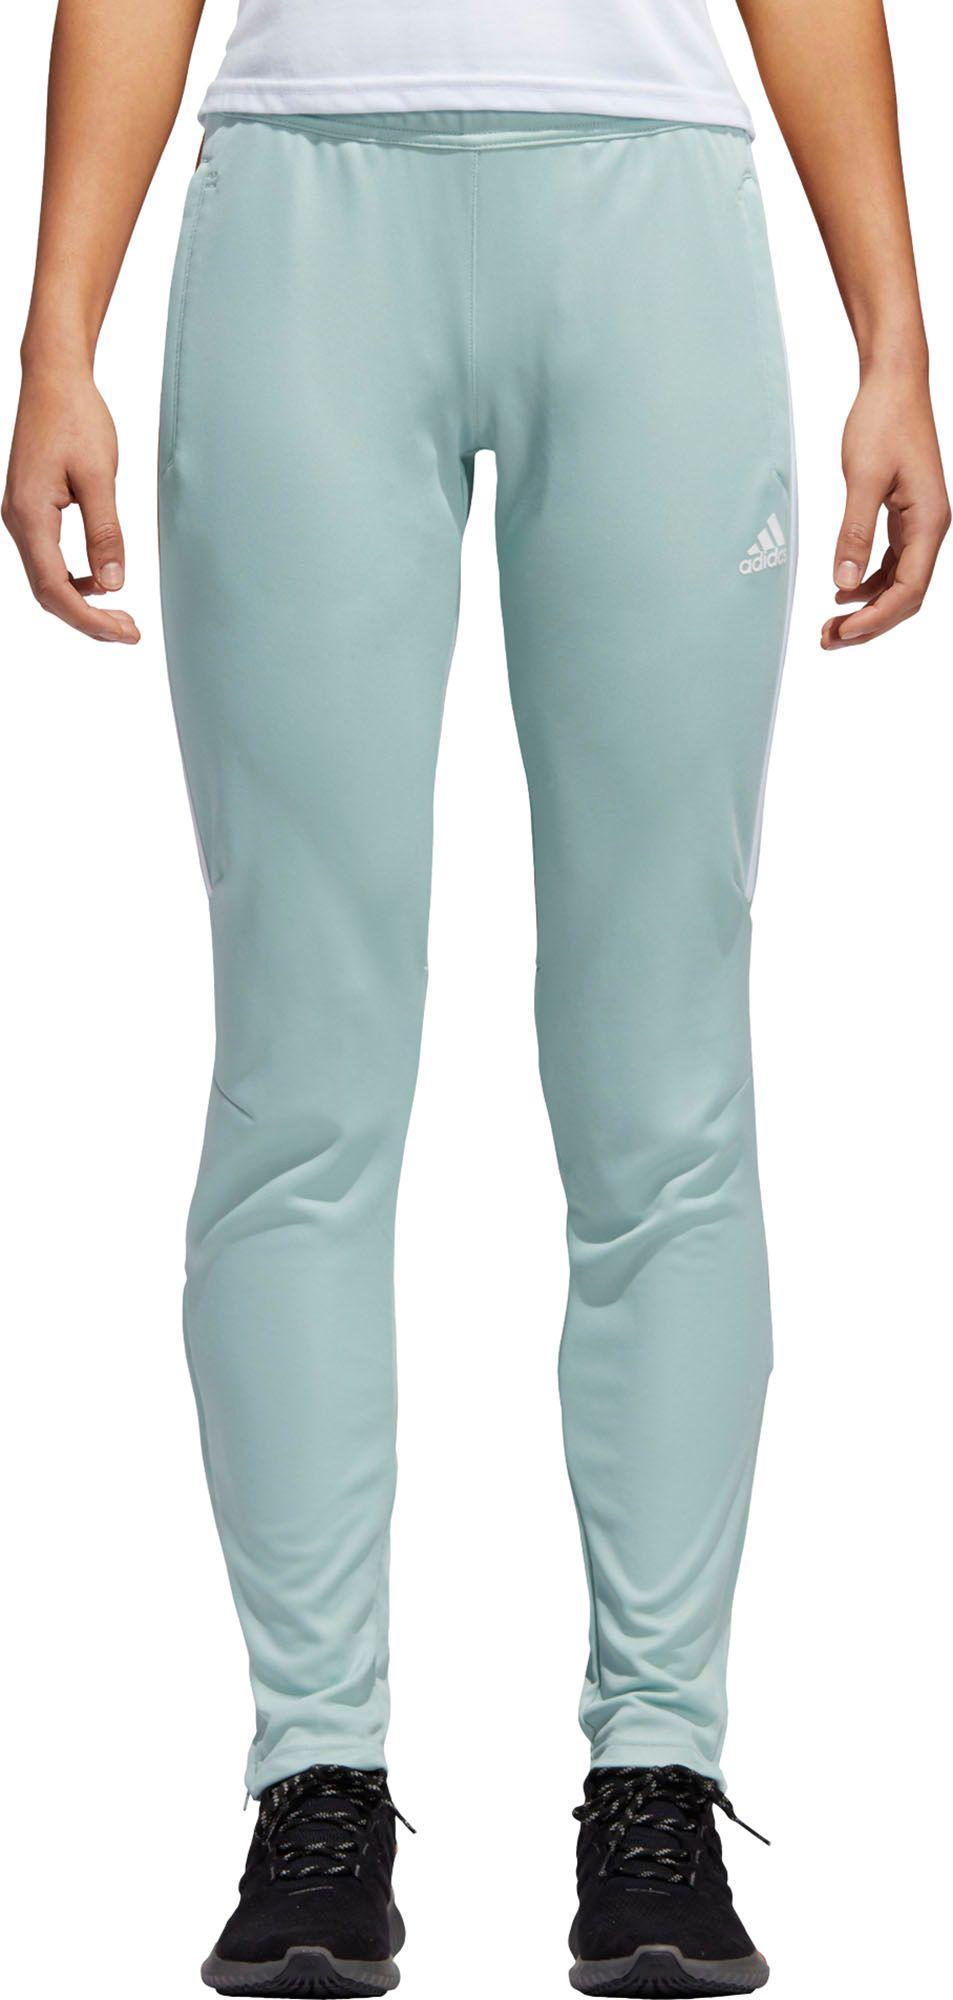 Adidas Green Tiro 17 Soccer Training Pants